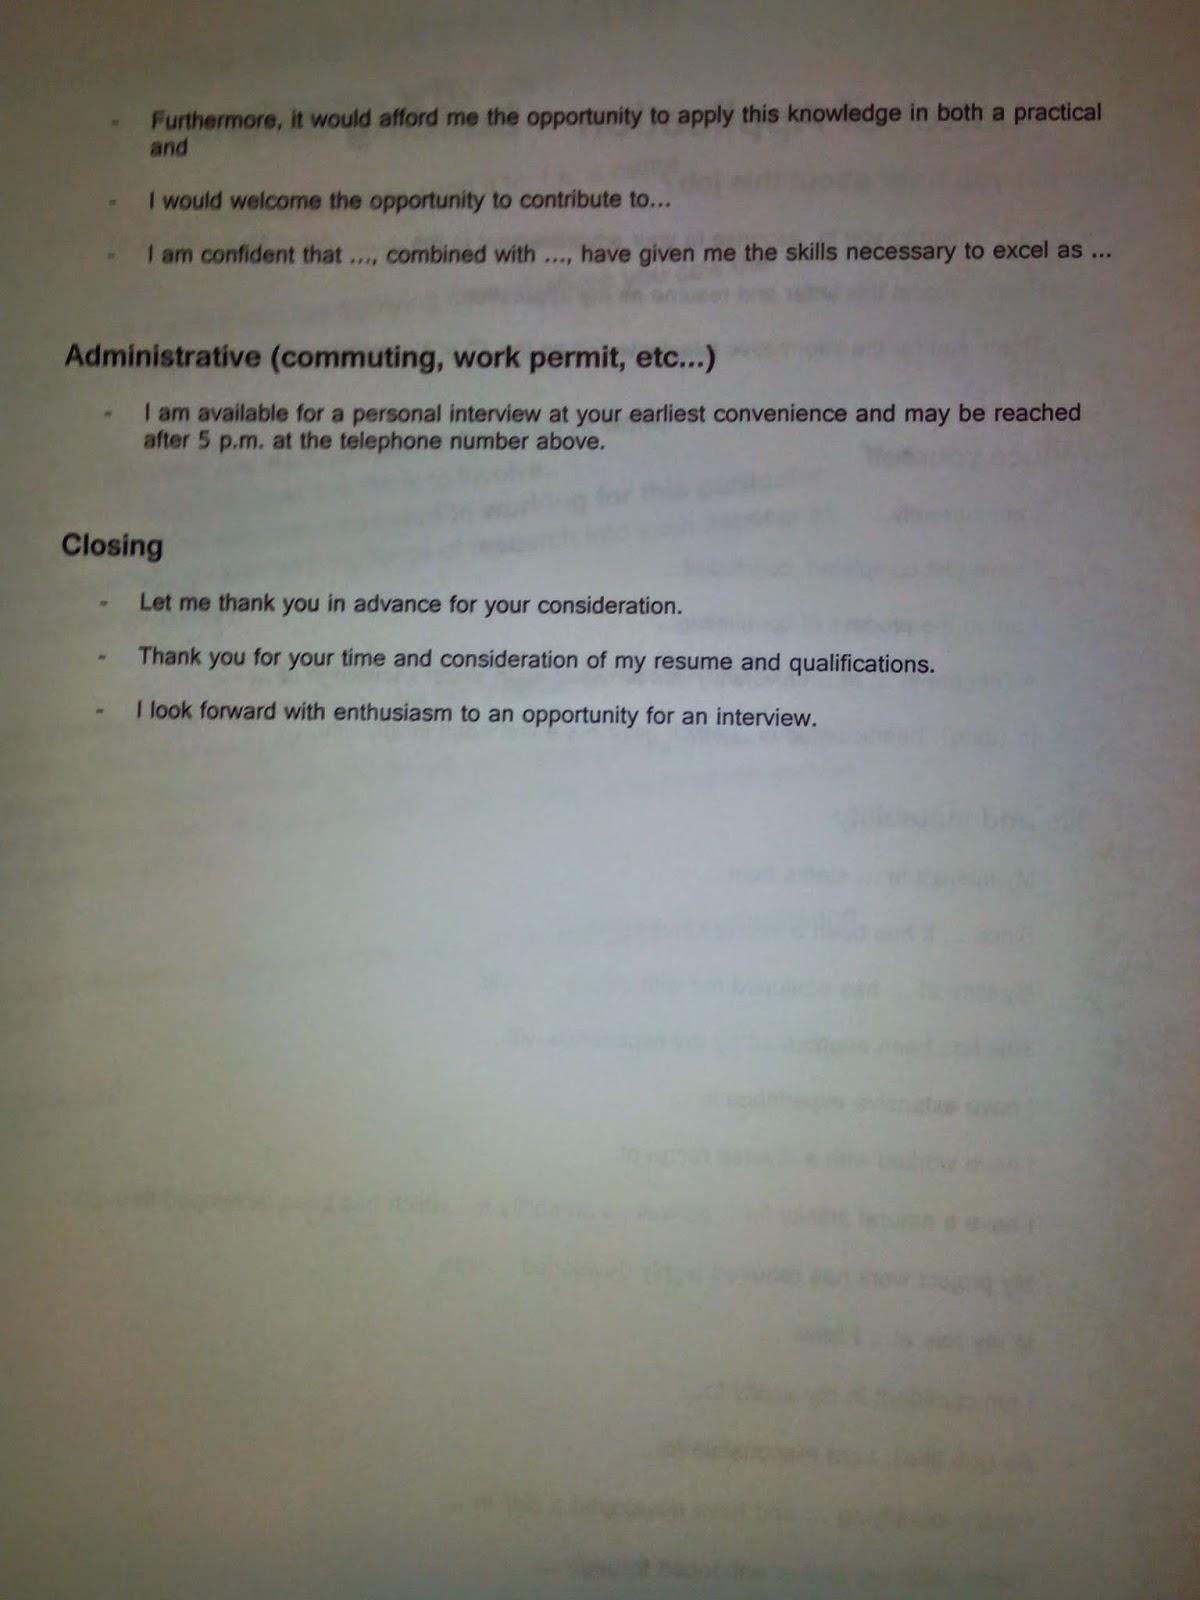 pavan paga  apply internship in germany  cover letter  resume format for job    internship